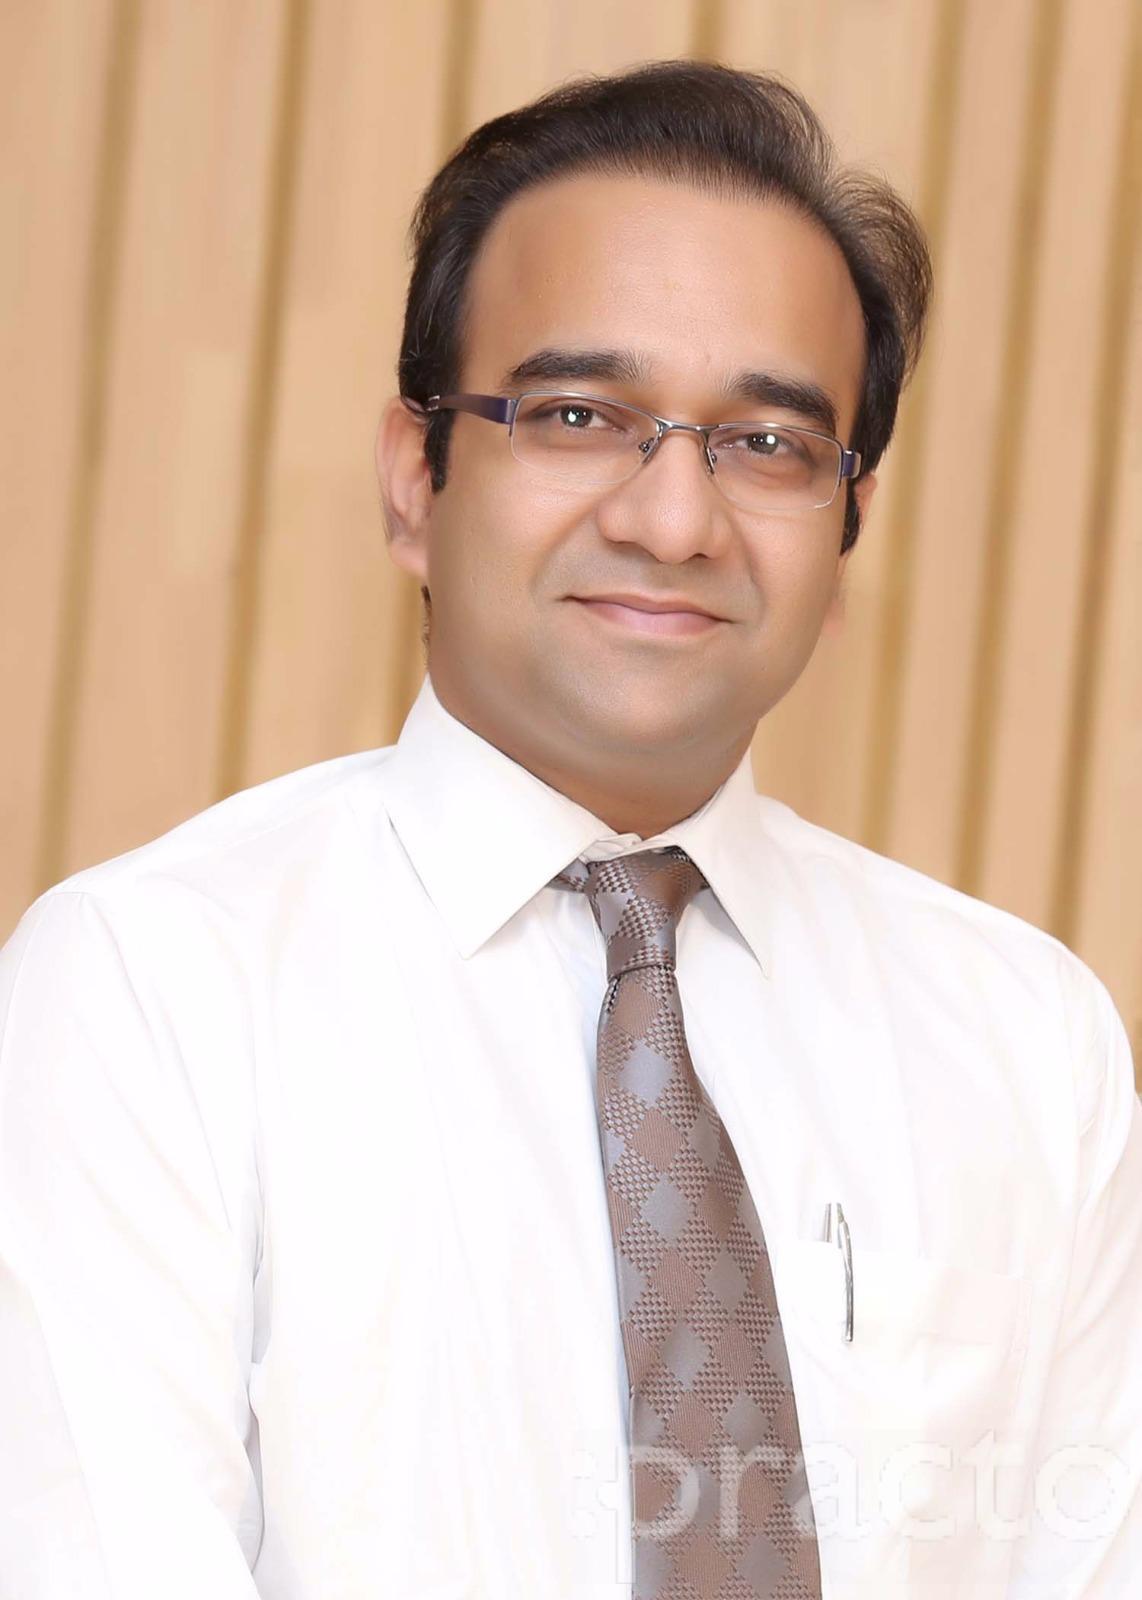 Dr. Vishal Tyagi - Ear-Nose-Throat (ENT) Specialist